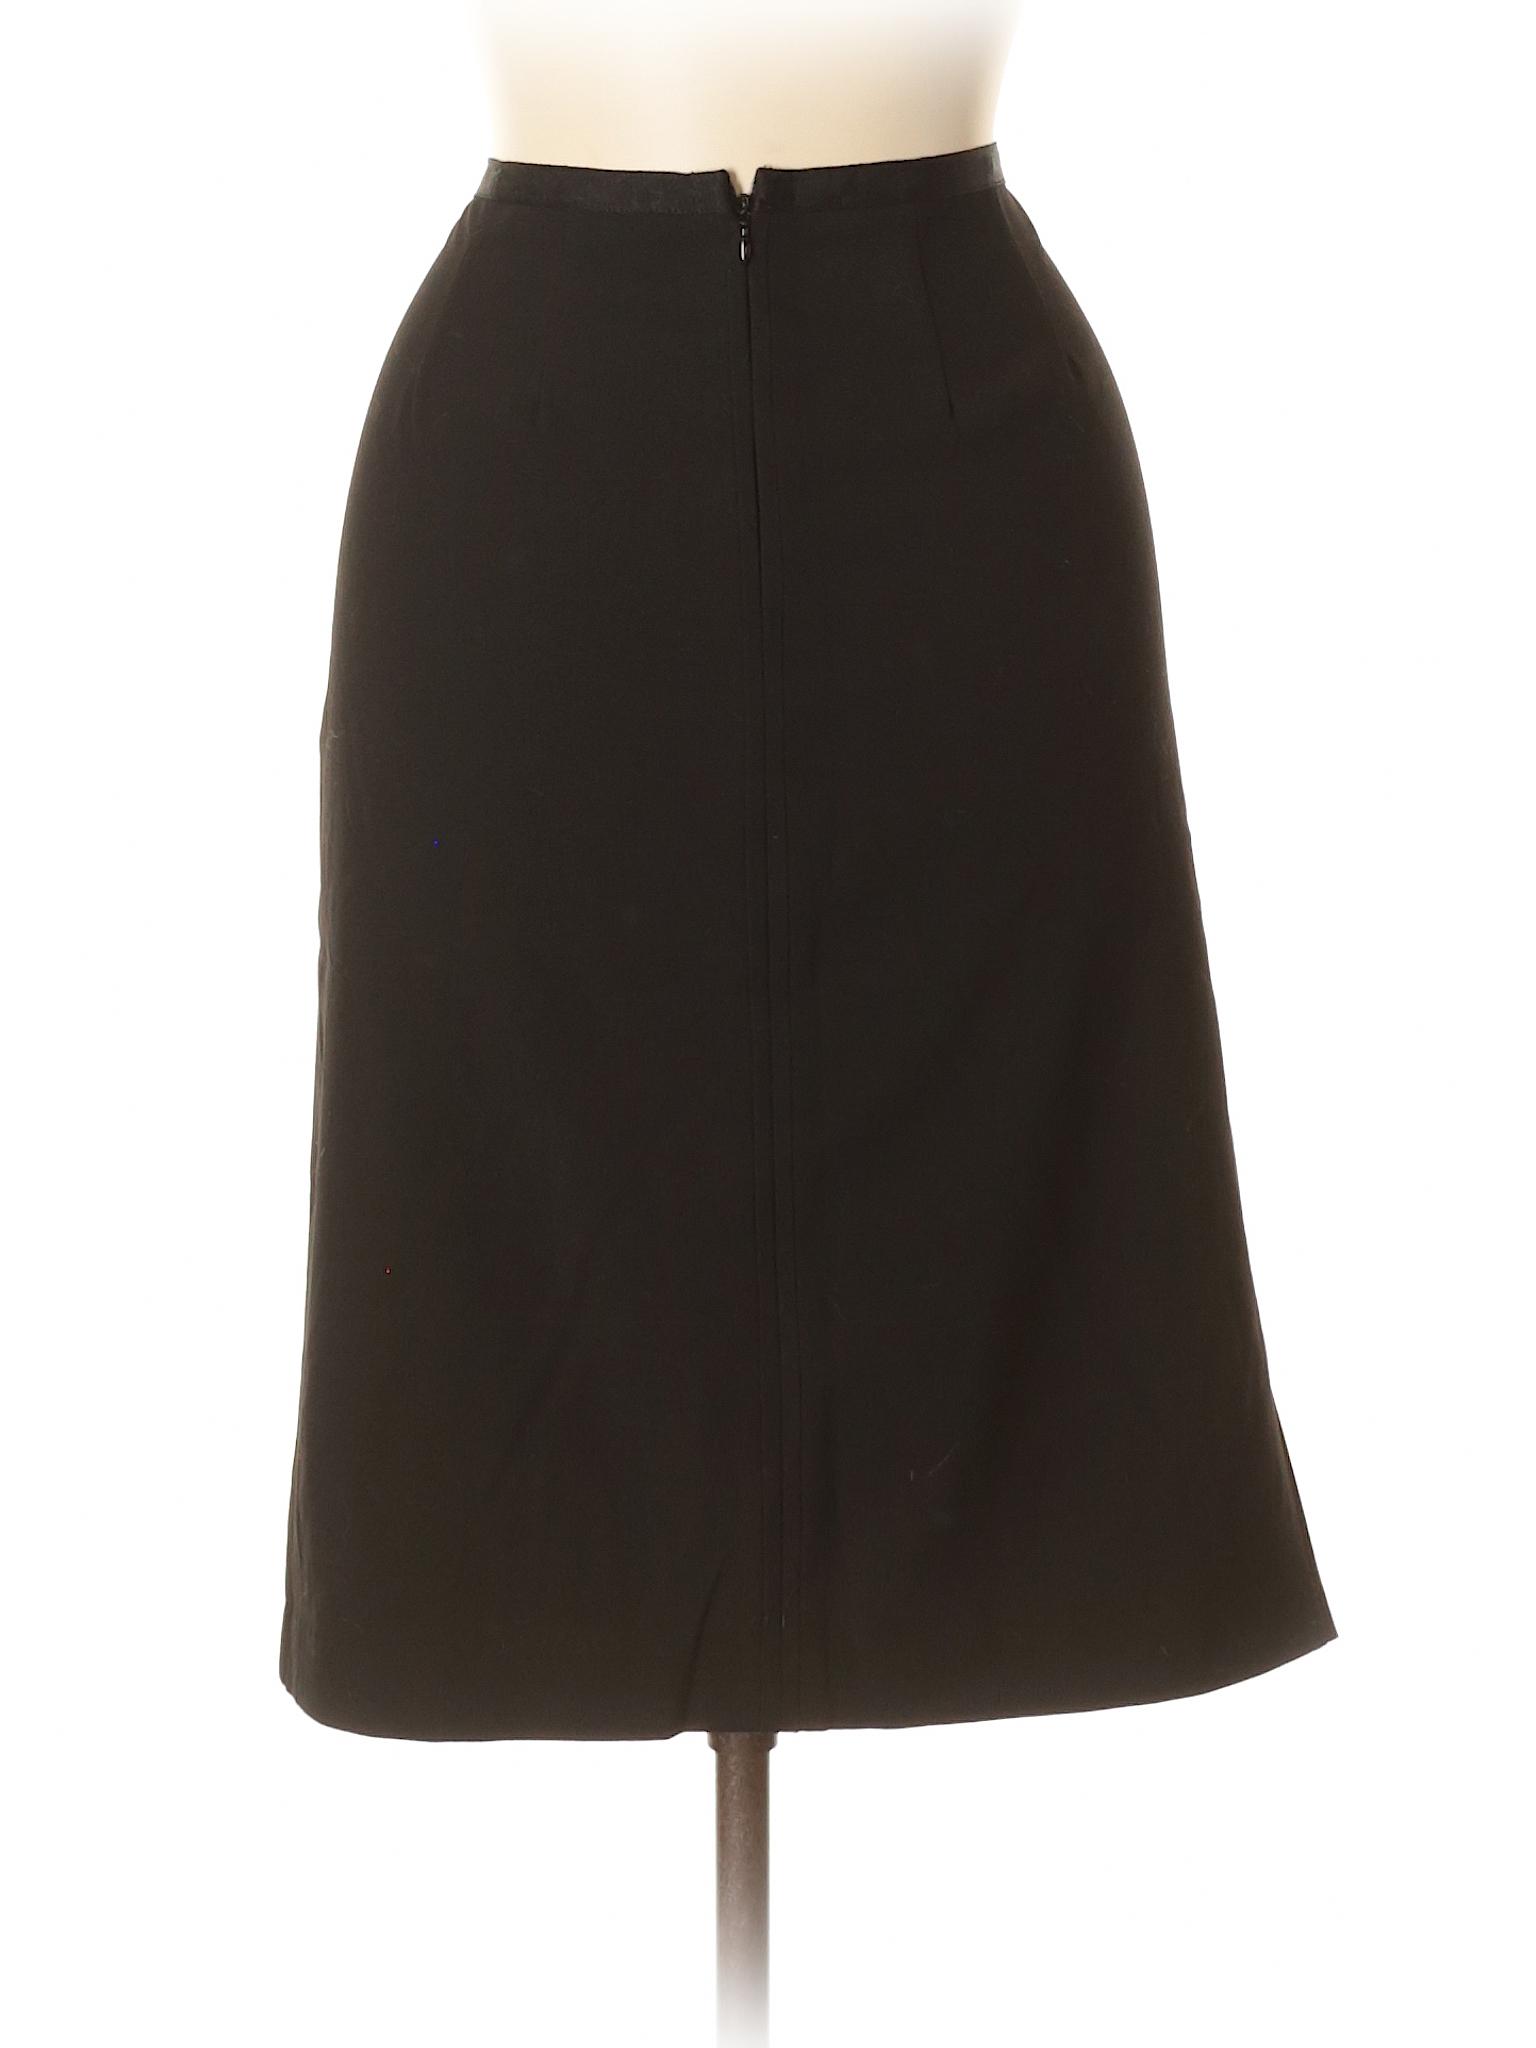 Company winter Skirt York New Casual Leisure amp; 8AxzIwwq